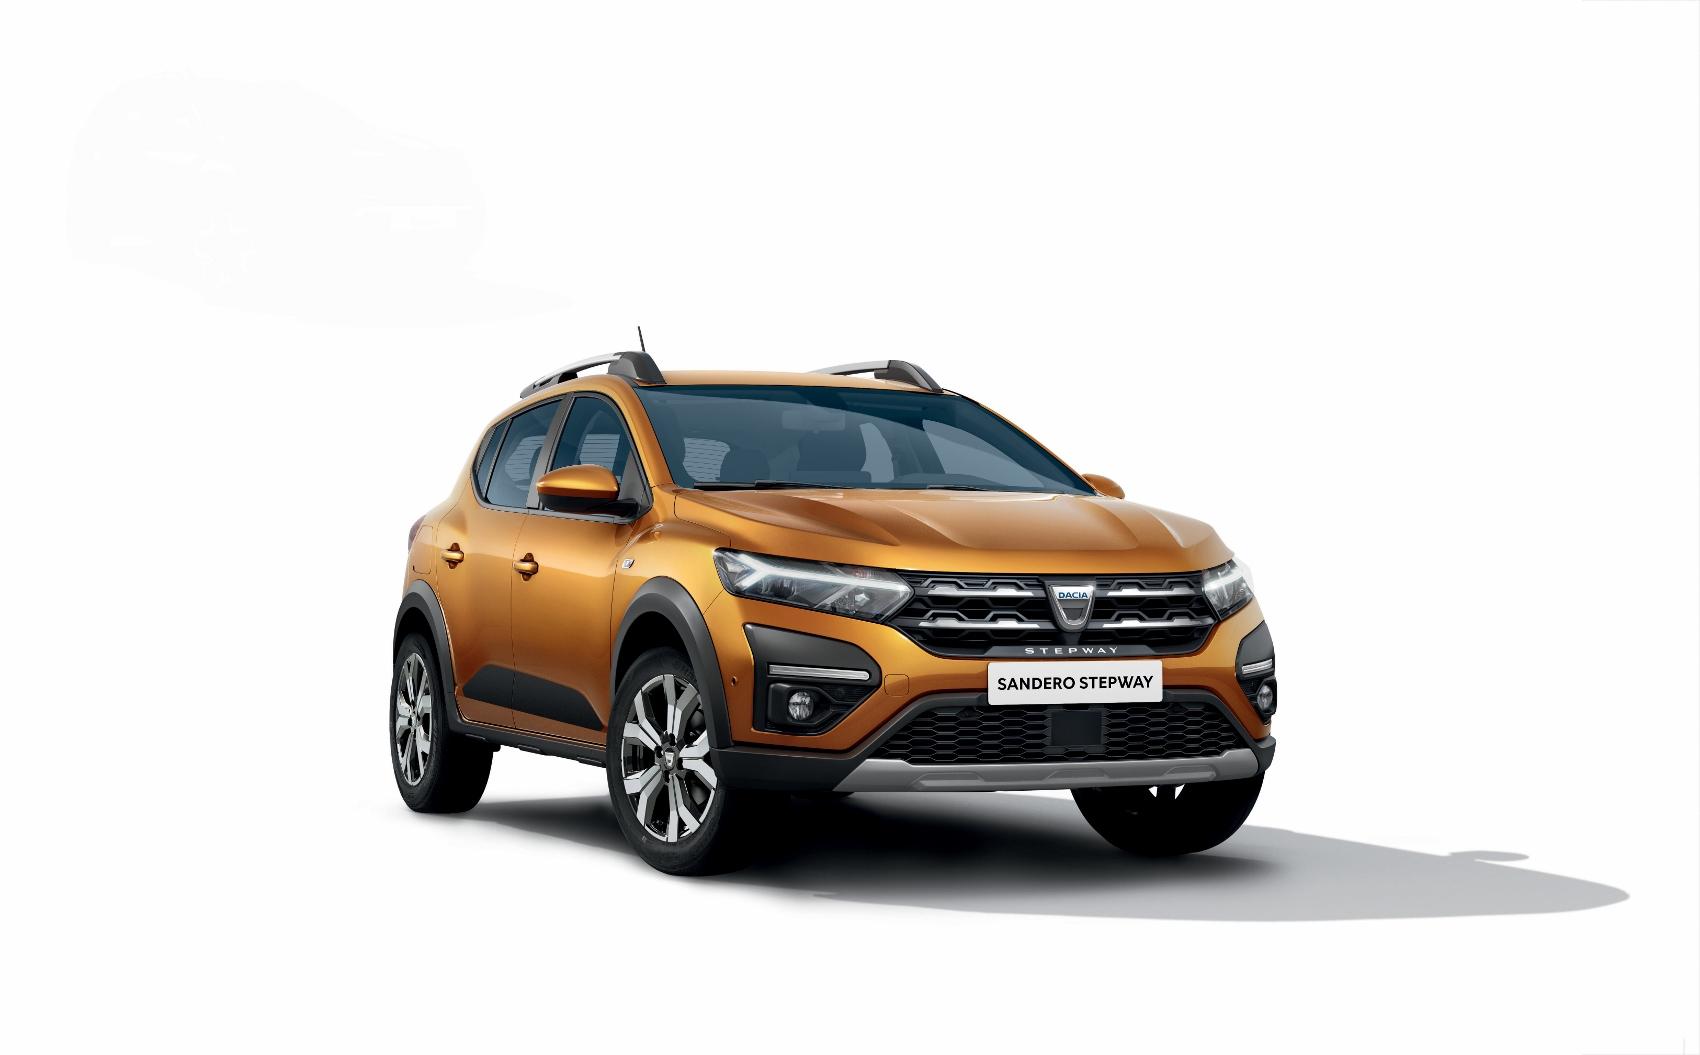 2020 - New Dacia SANDERO STEPWAY (3) (1700x1055)